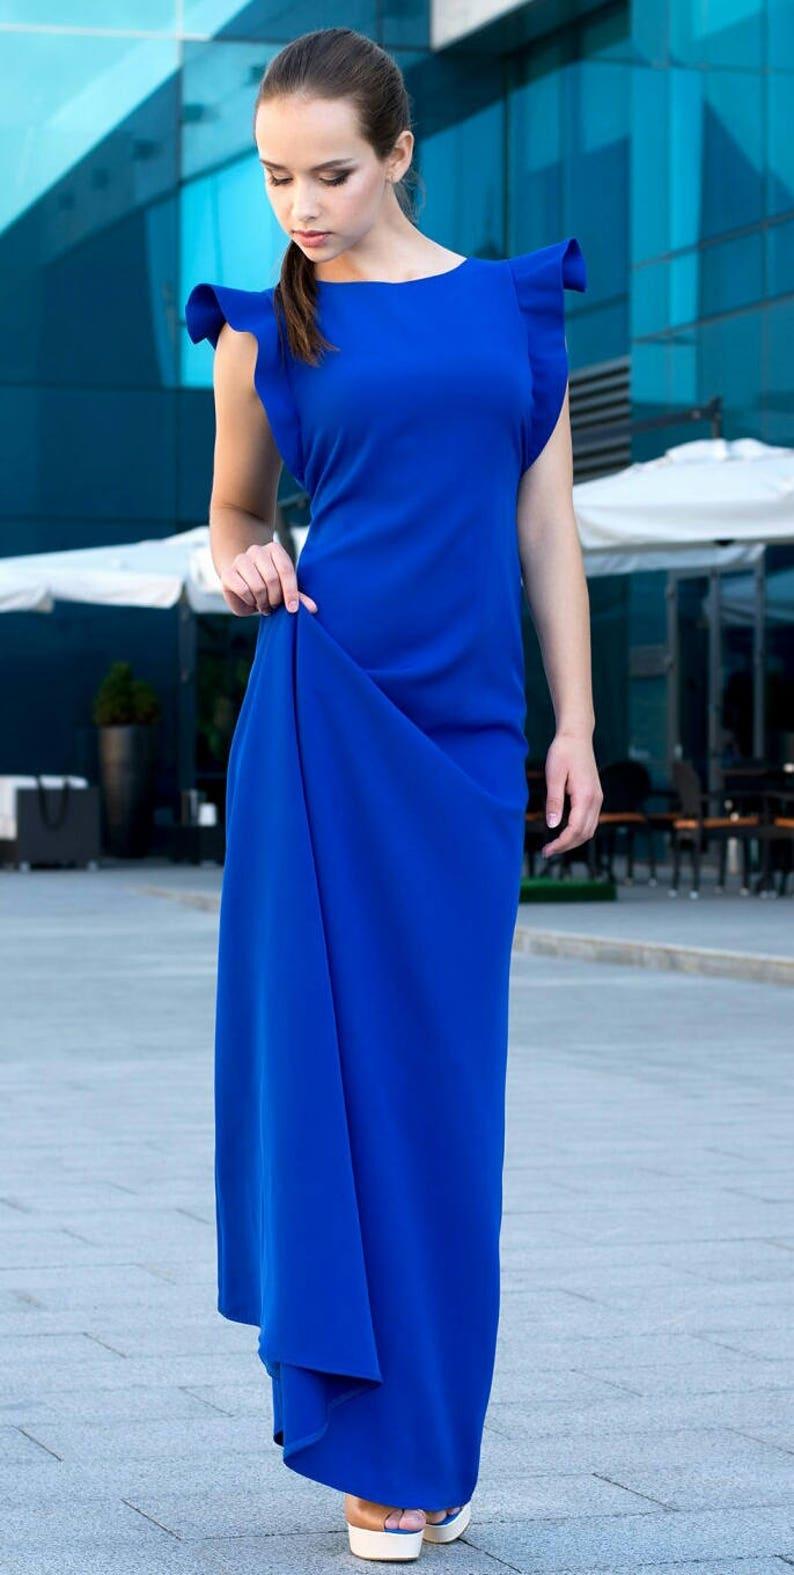 Lange HerfstEtsy Blue Voorjaar Jurk Maxi Royal Fl3JcKT1